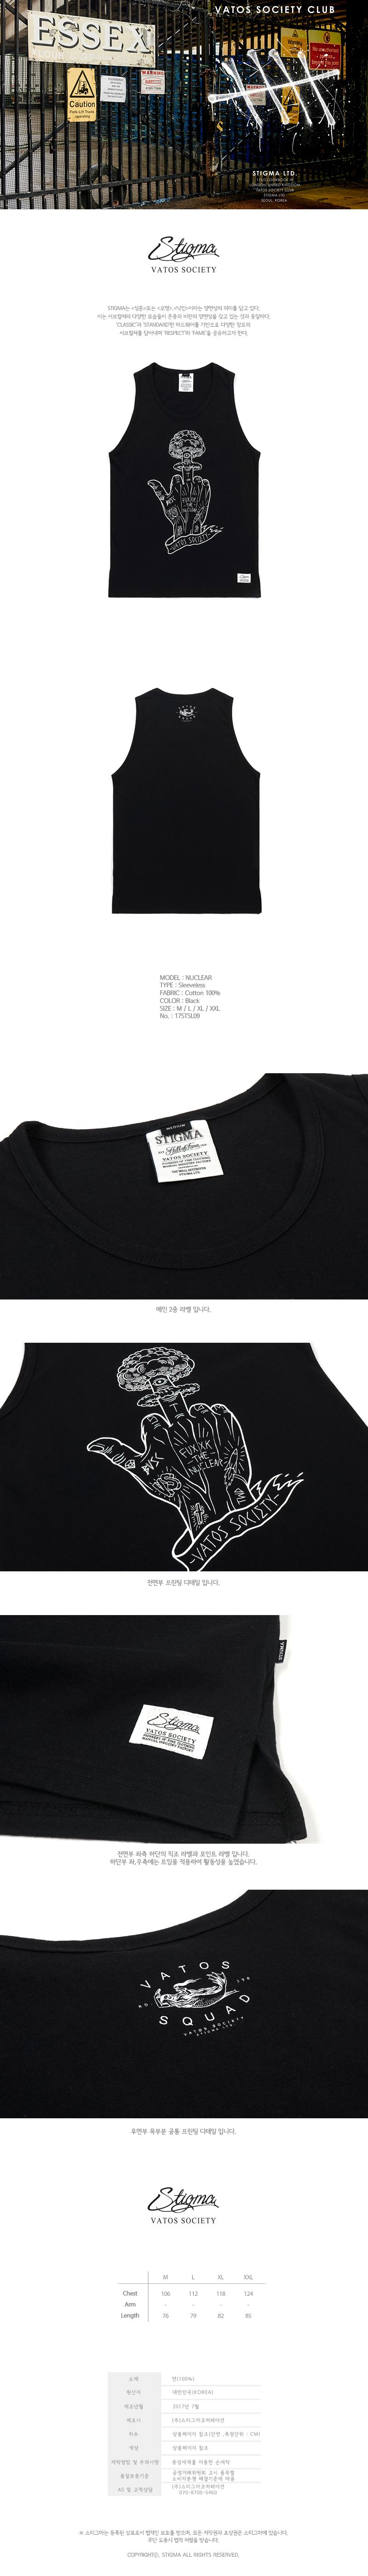 NUCLEAR SLEEVELESS BLACK32,000원-스티그마패션의류, 남성상의, 티셔츠, 나시/민소매티셔츠바보사랑NUCLEAR SLEEVELESS BLACK32,000원-스티그마패션의류, 남성상의, 티셔츠, 나시/민소매티셔츠바보사랑